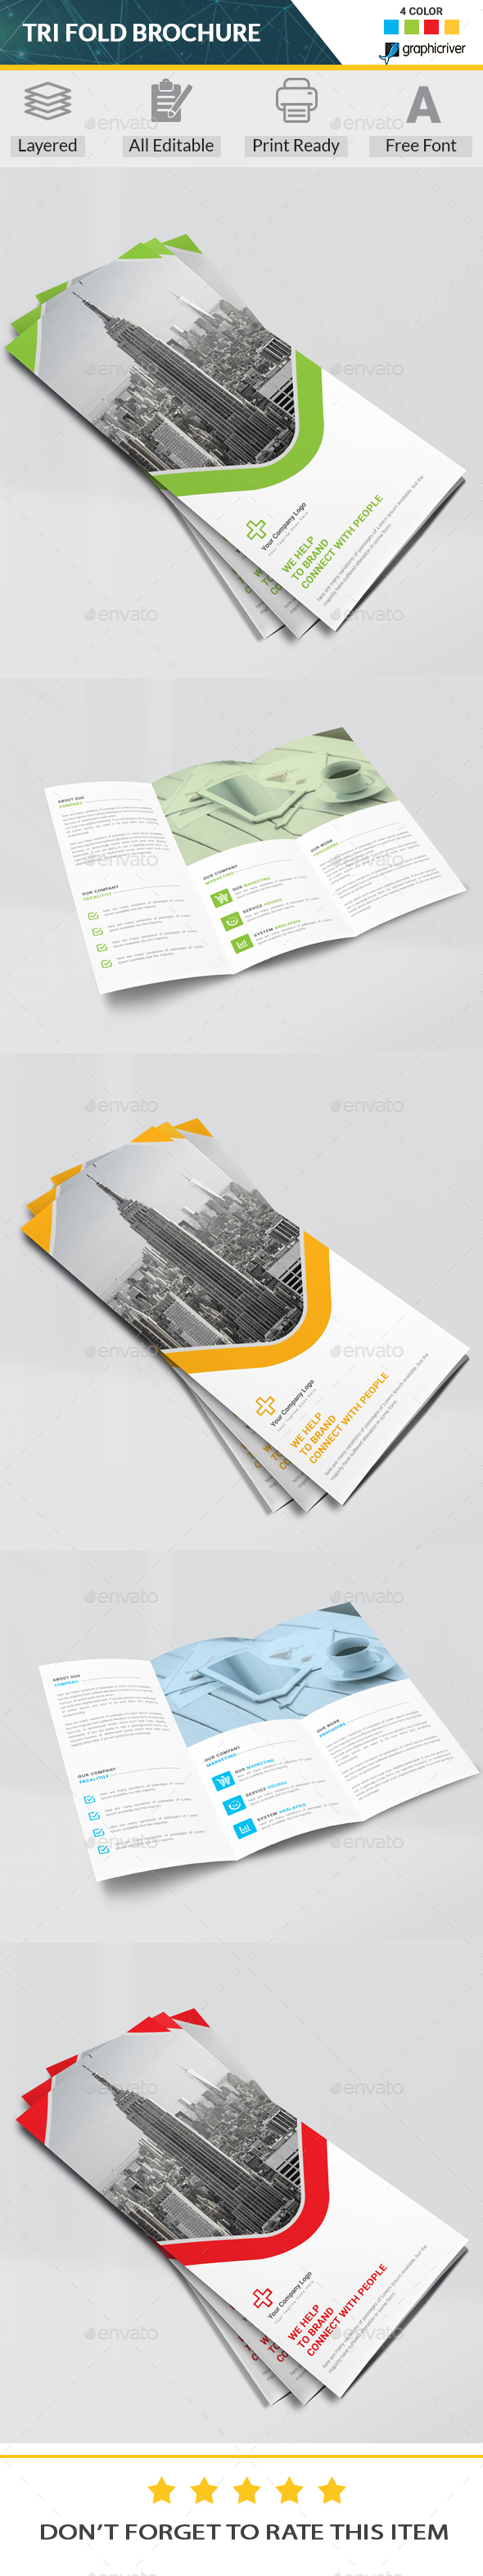 Tri Fold Brochure Template Psd Brochure Templates Pinterest